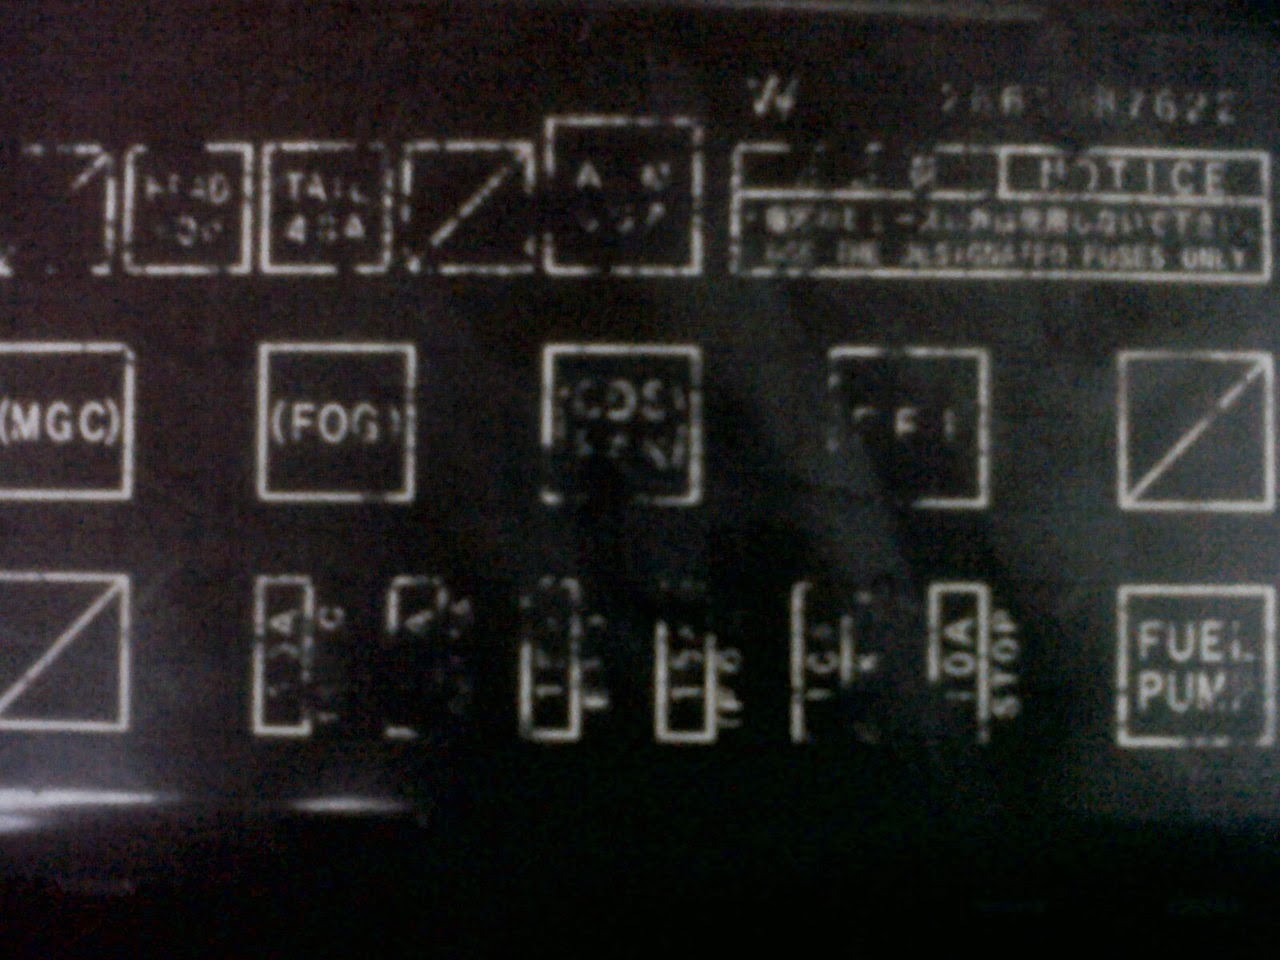 hight resolution of fuse box daihatsu taruna schematic diagramfuse box daihatsu taruna wiring diagram daihatsu wagon r fuse box